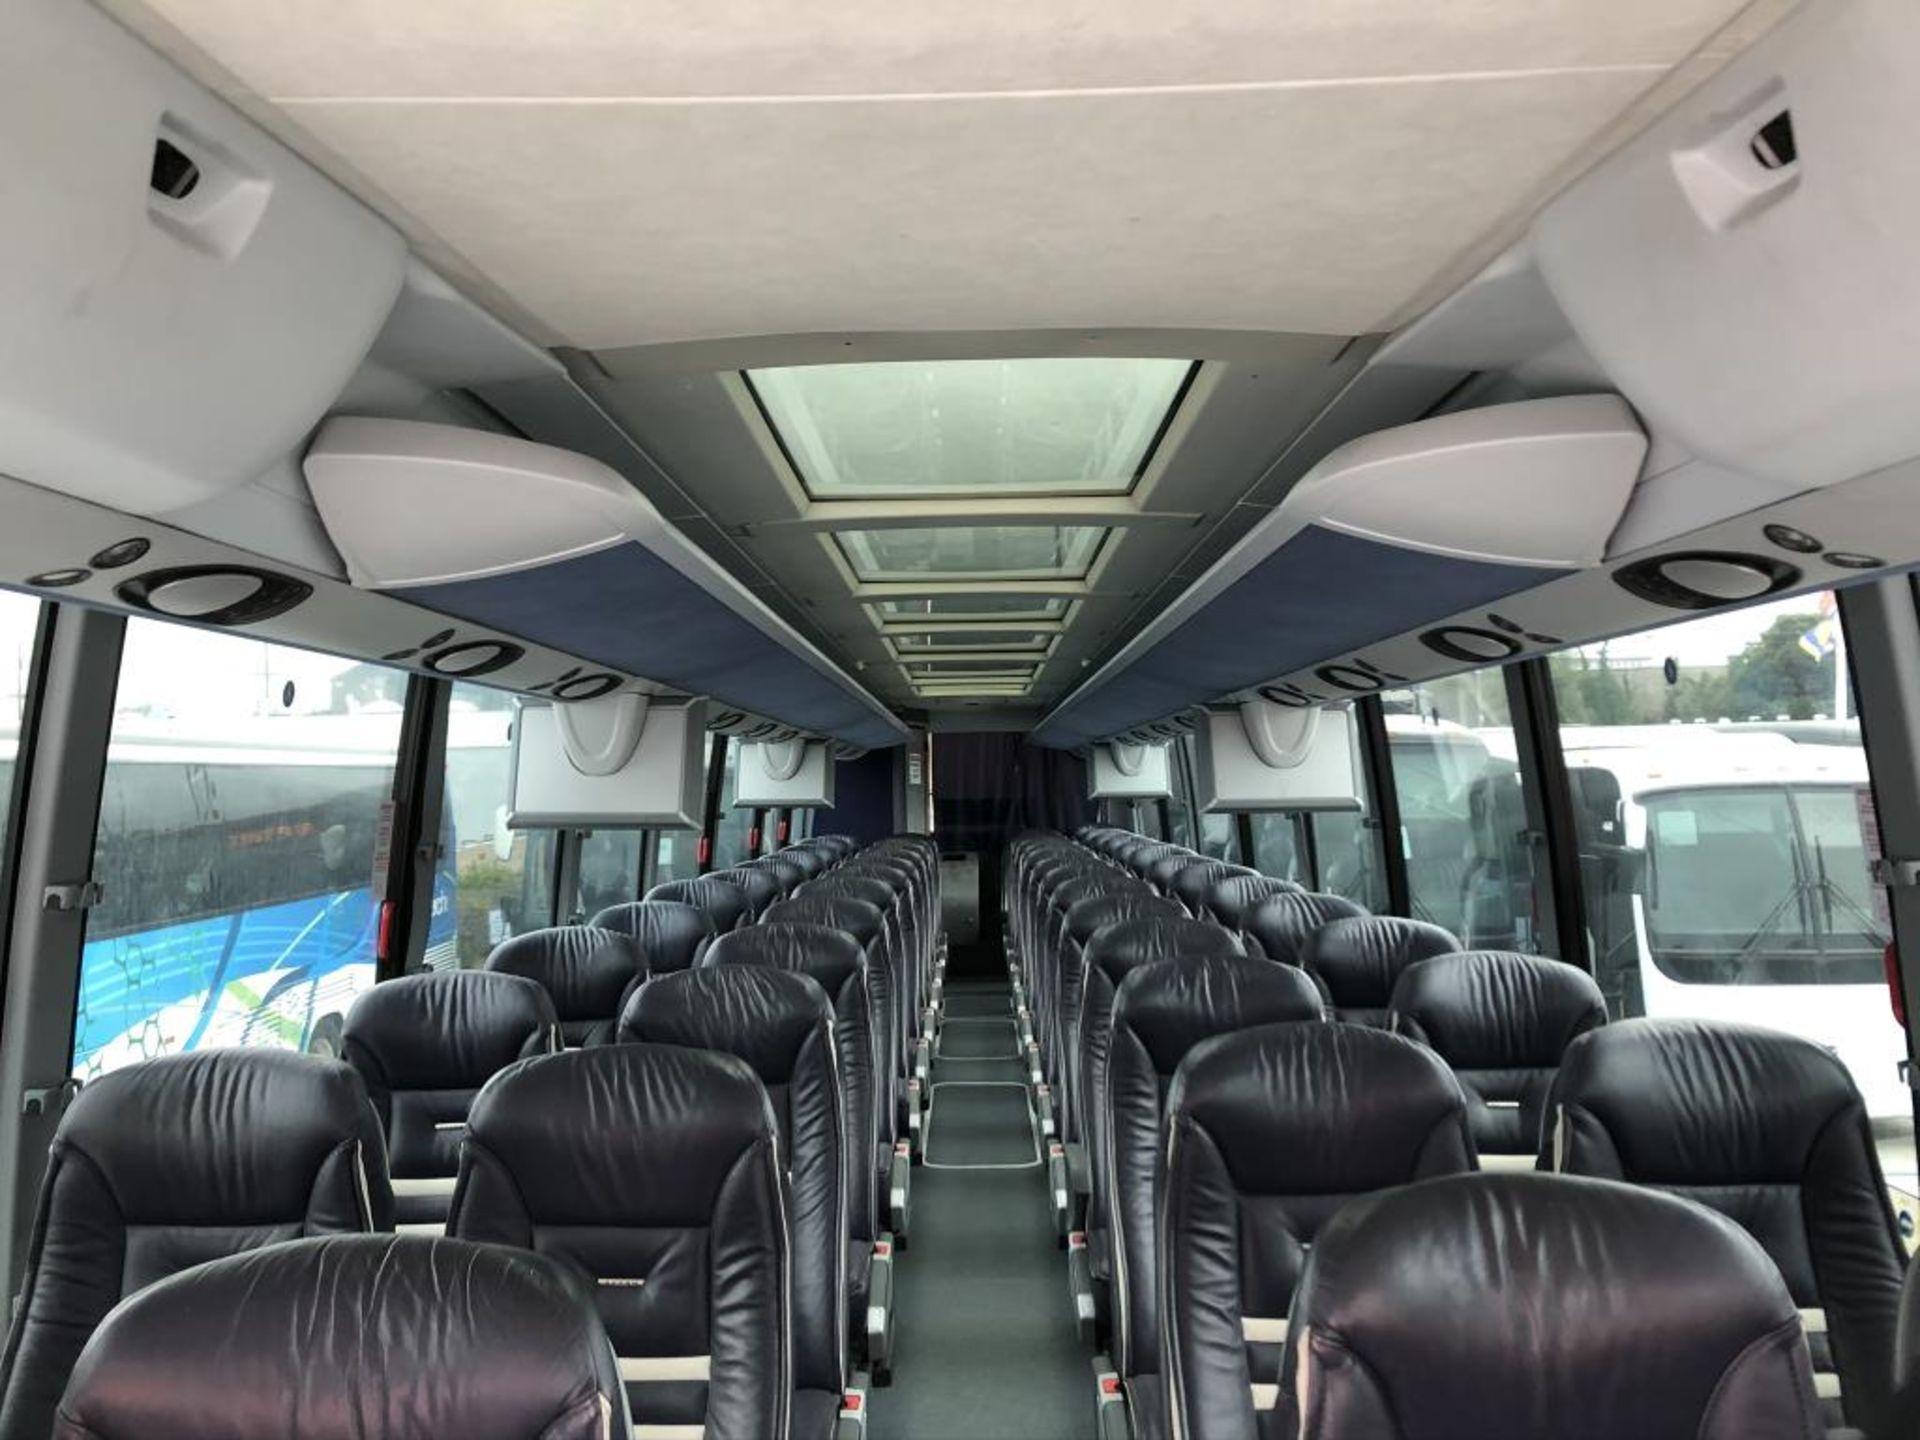 Motor Coach - Image 8 of 18